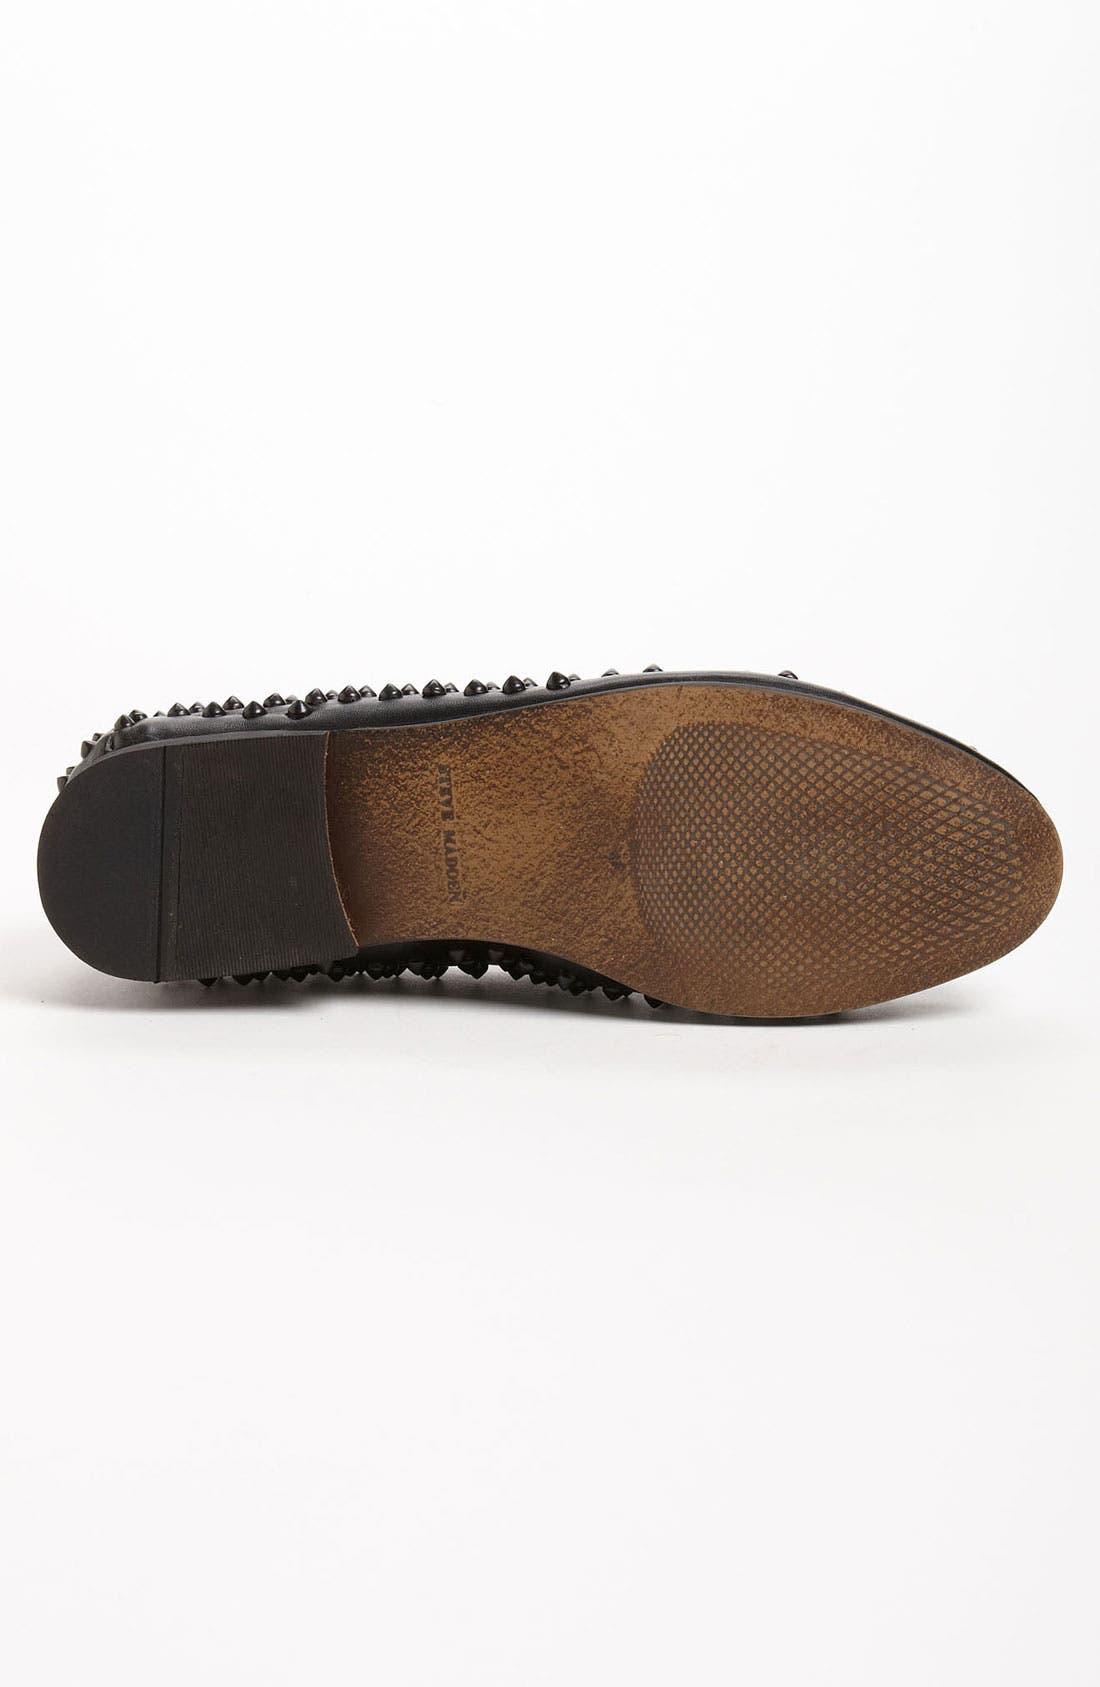 Alternate Image 4  - Steve Madden 'Jagggrr' Studded Loafer